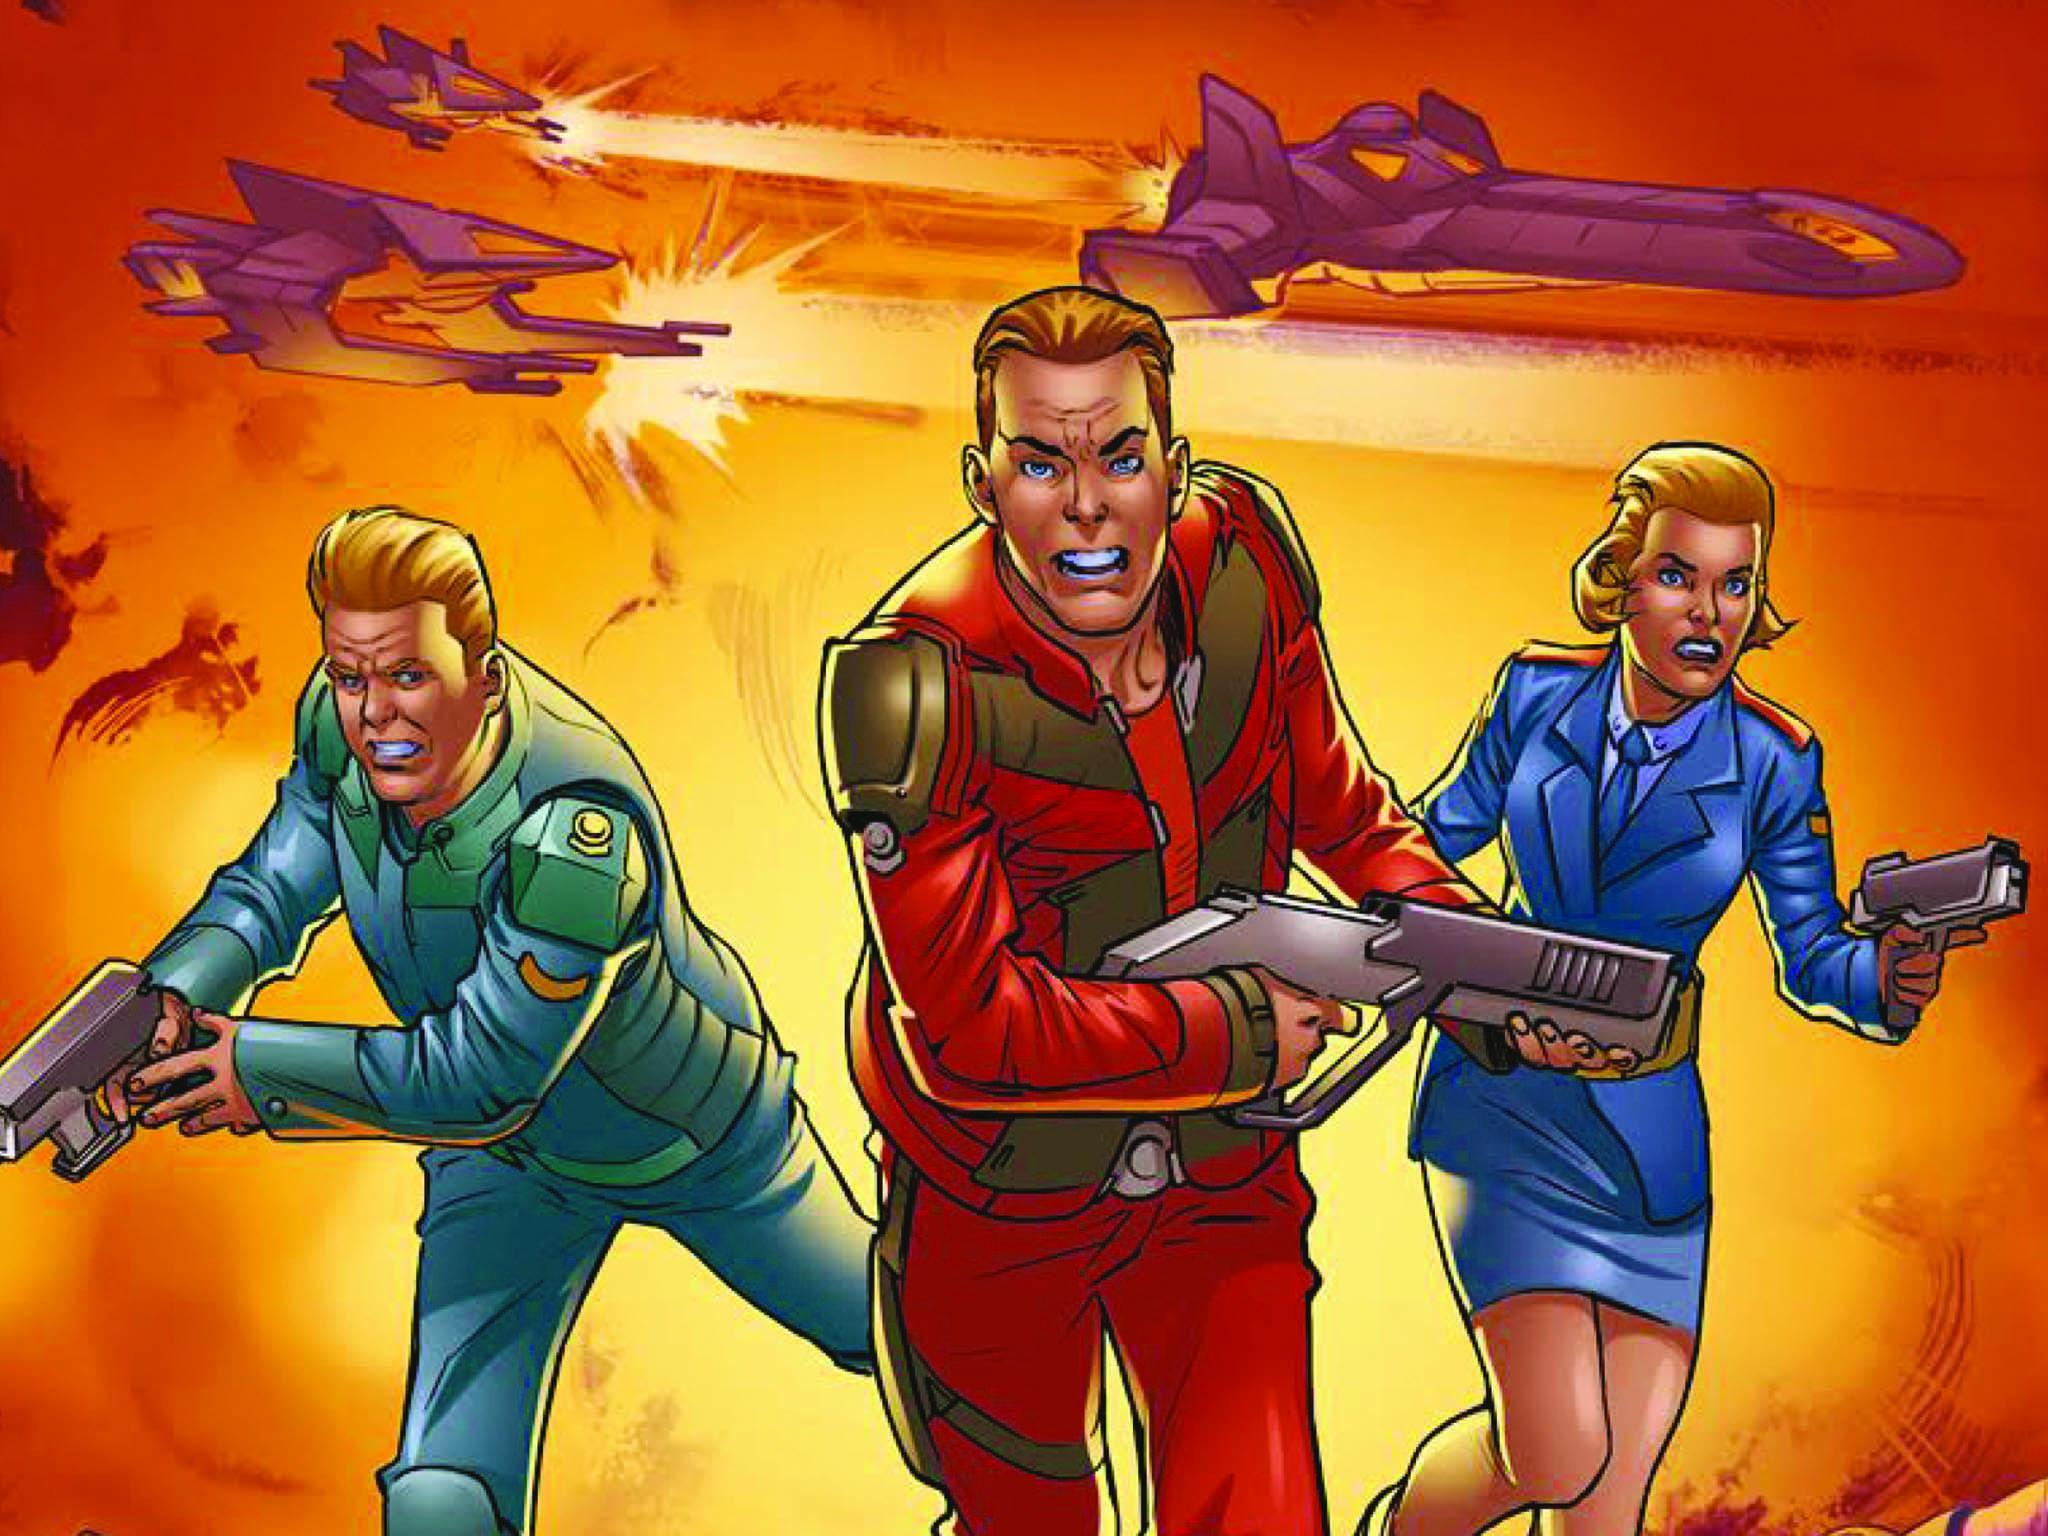 Dan Dare: How the British superhero survived to make the digital age